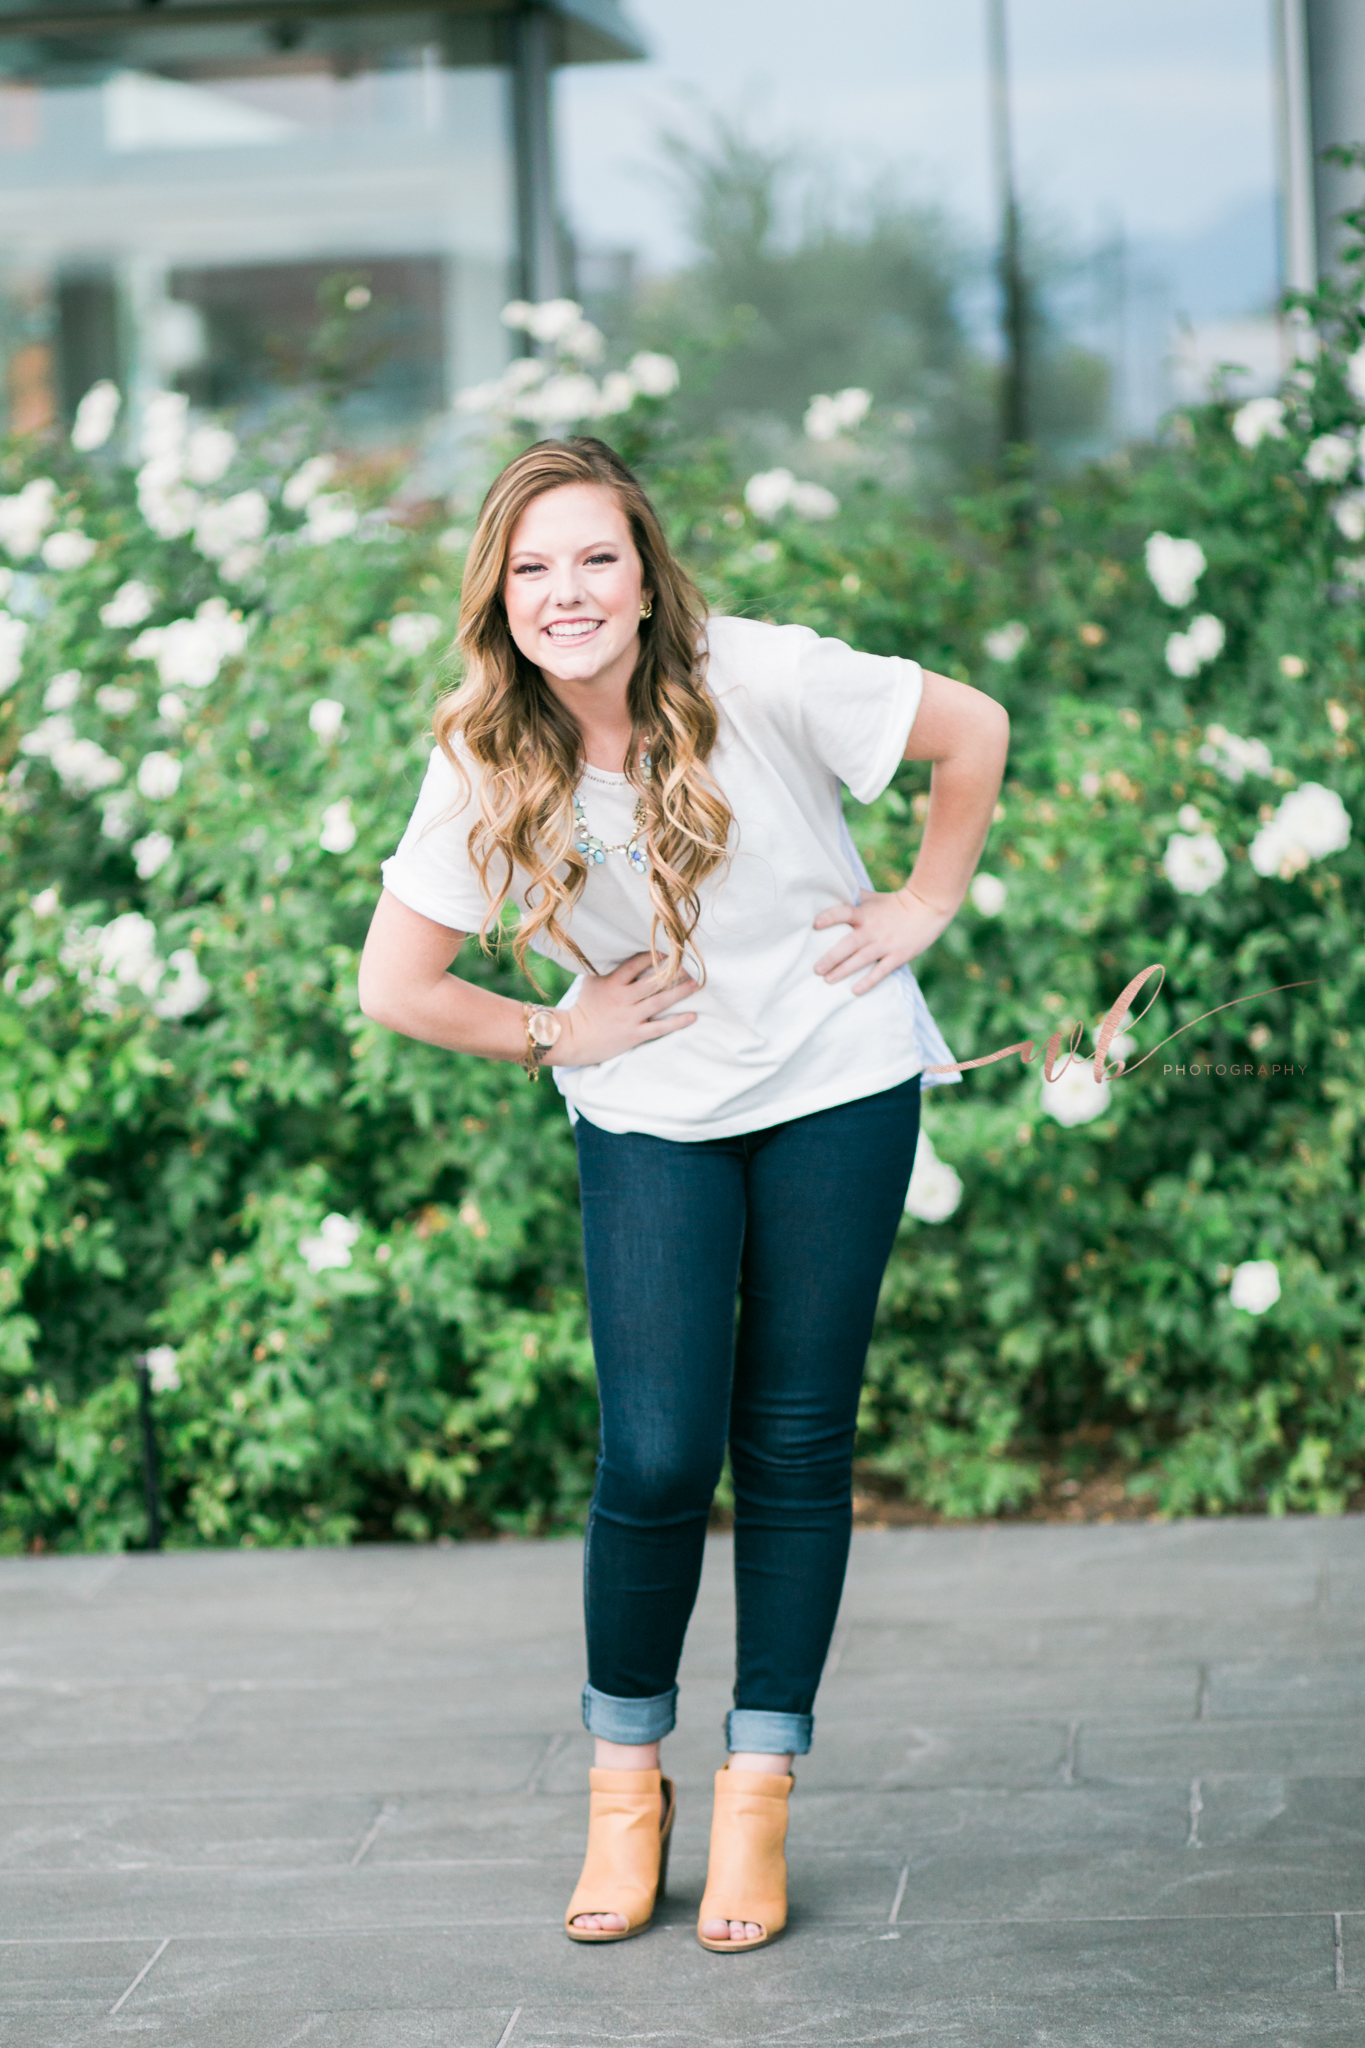 Senior pictures in Rose bushes